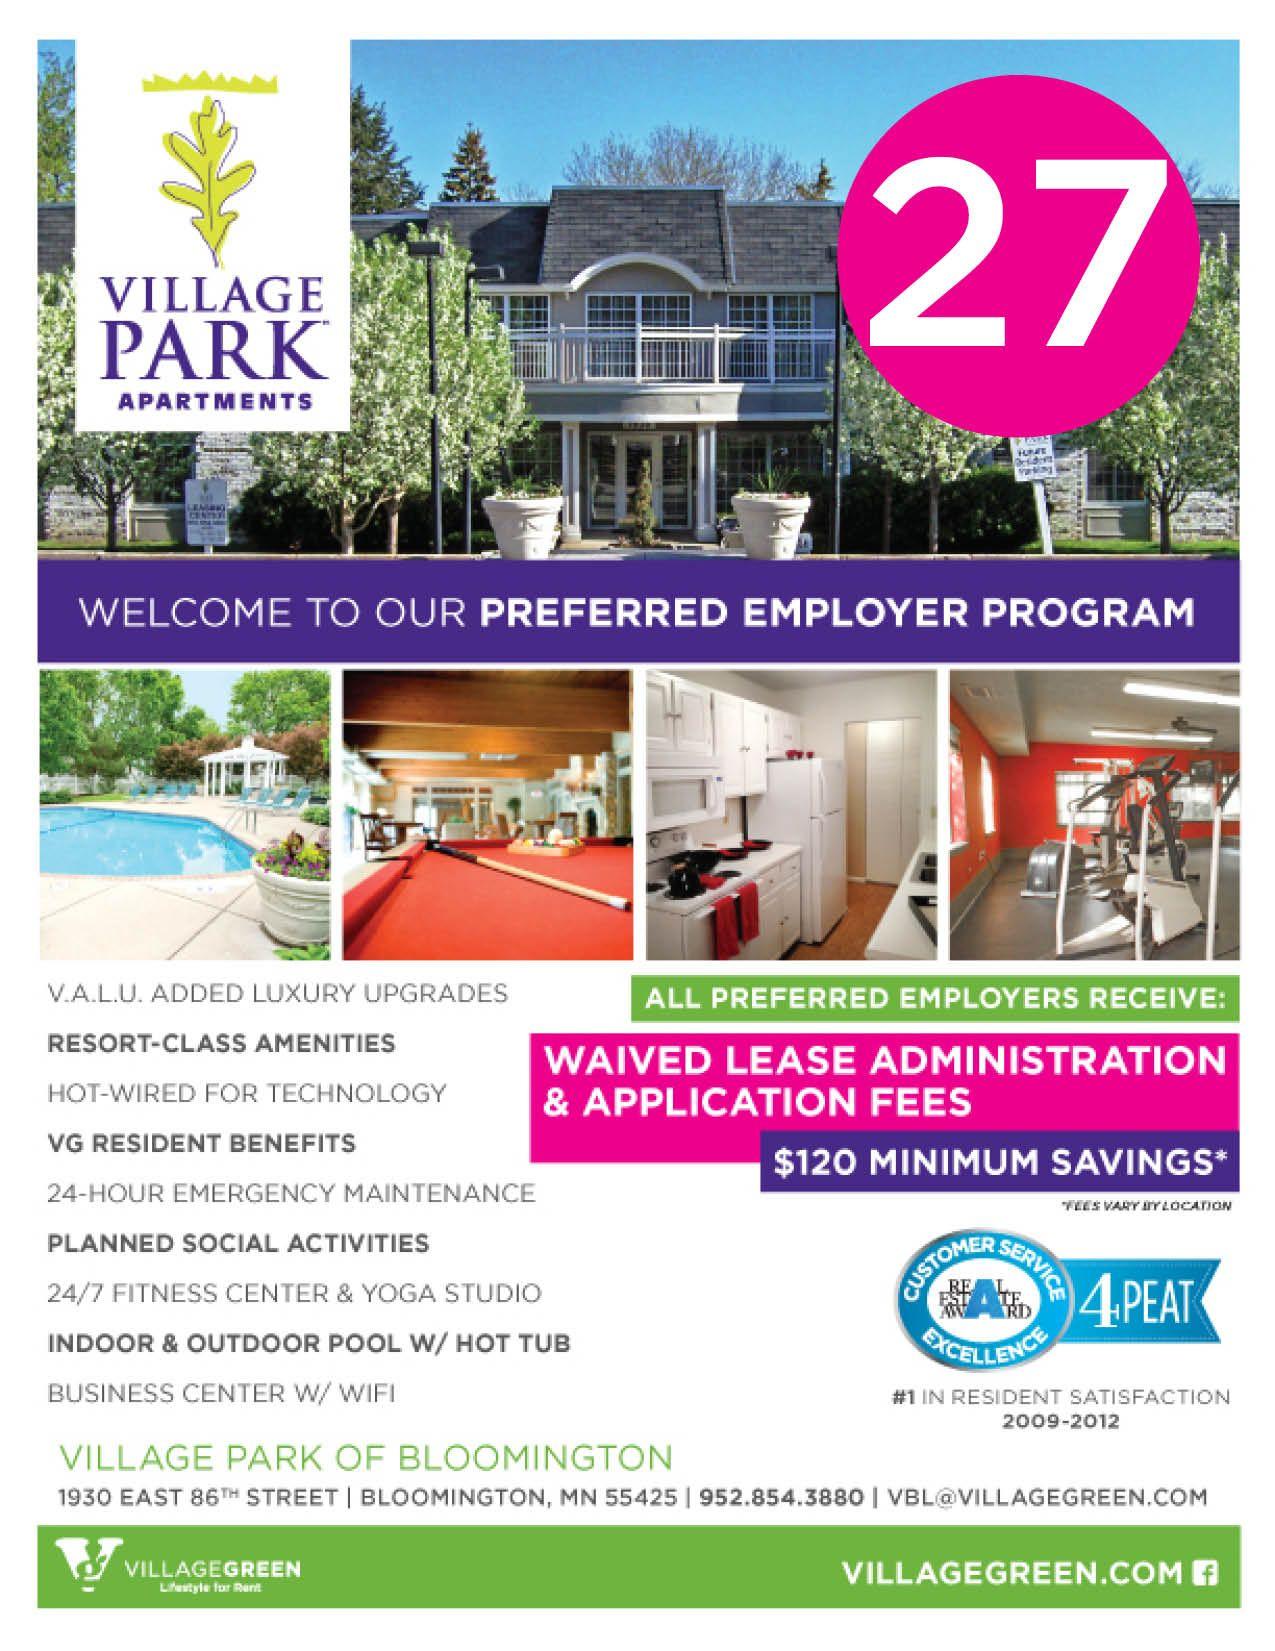 preferred employer program template pep program preferred employer program template middot apartment leasingapartment marketingoutreach flyersemployer